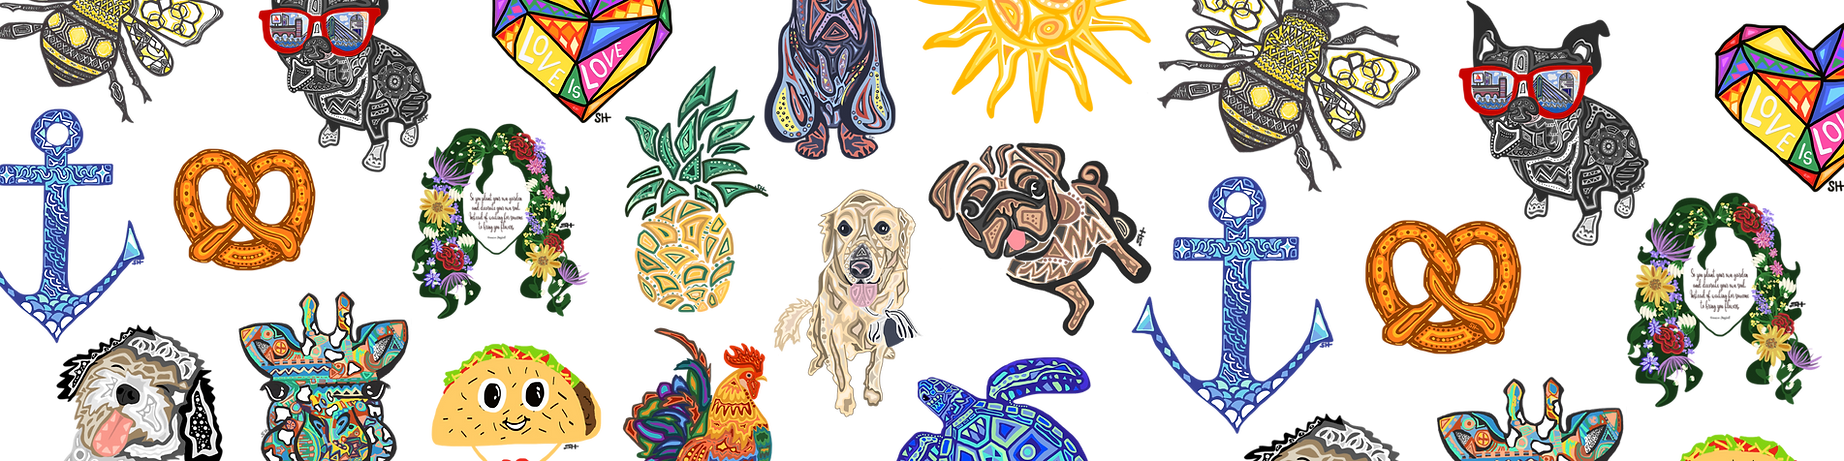 Sarah Hiers Design Custom Art Collage We